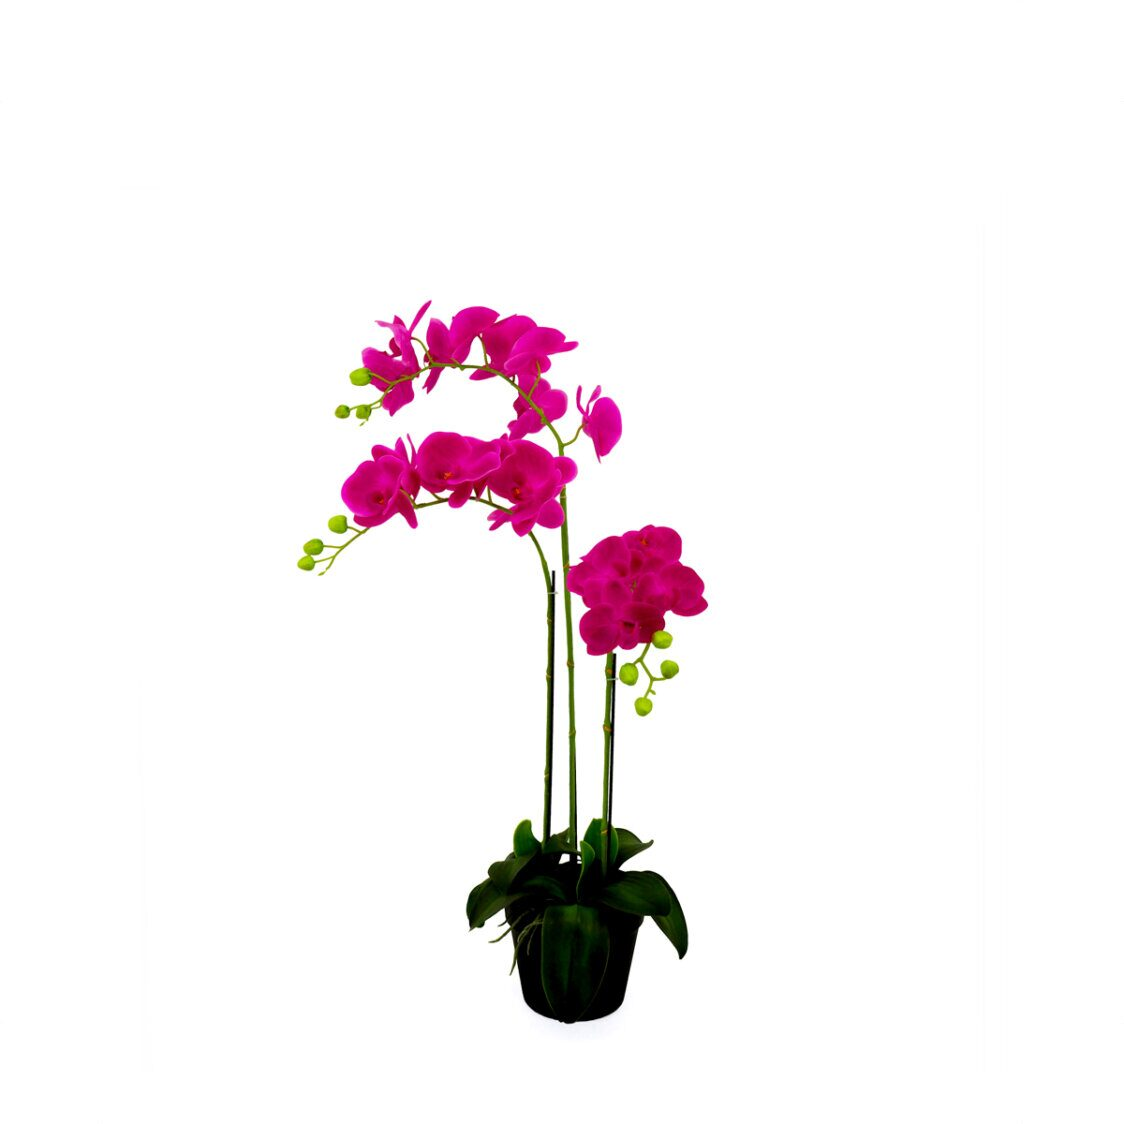 Pollyanna 3 Stalk Potted Fuschia Orchid